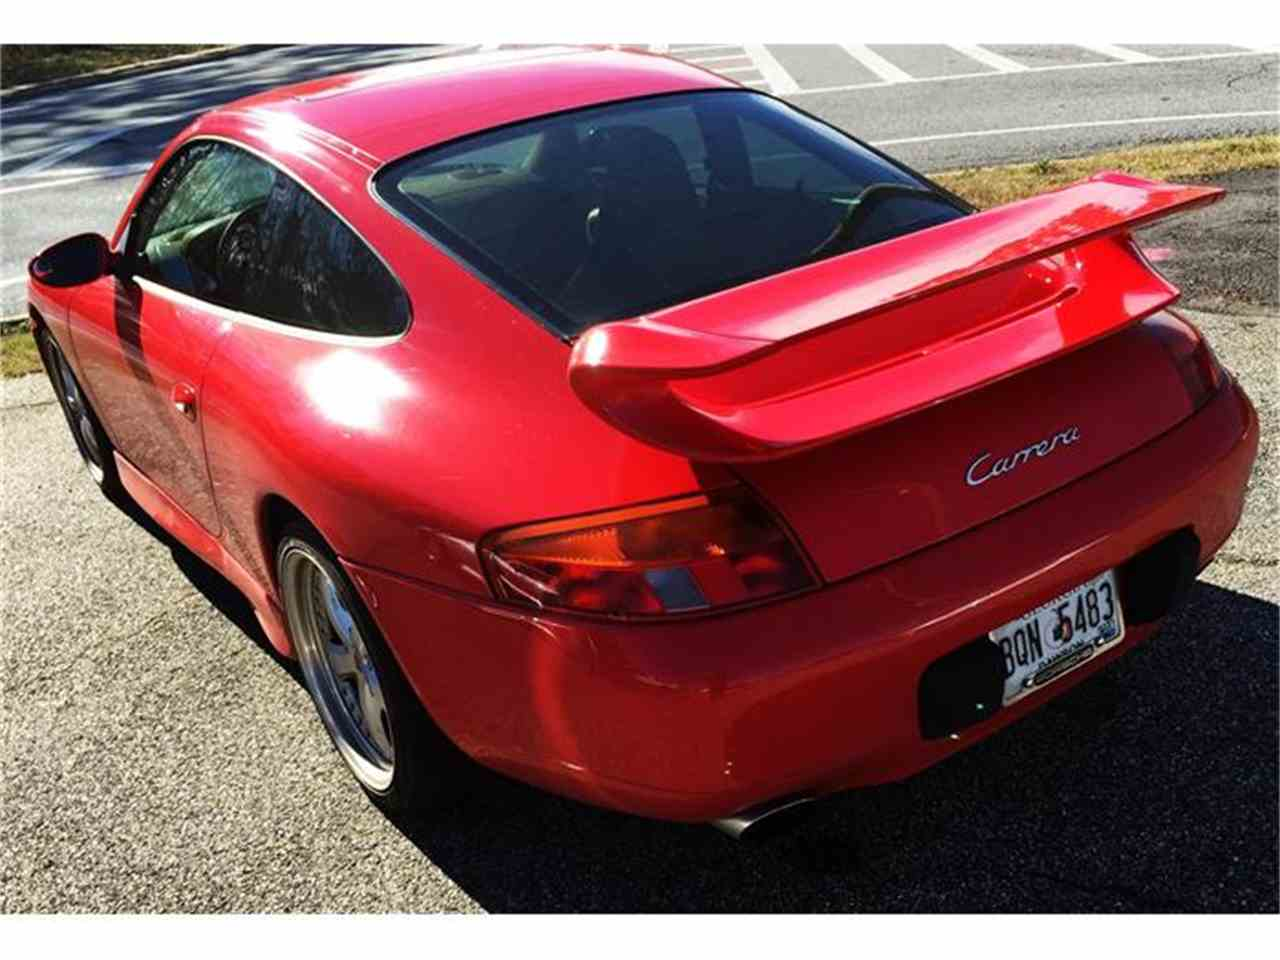 Large Picture of '99 Porsche 911 Carrera 2 - $15,390.00 - GBPE